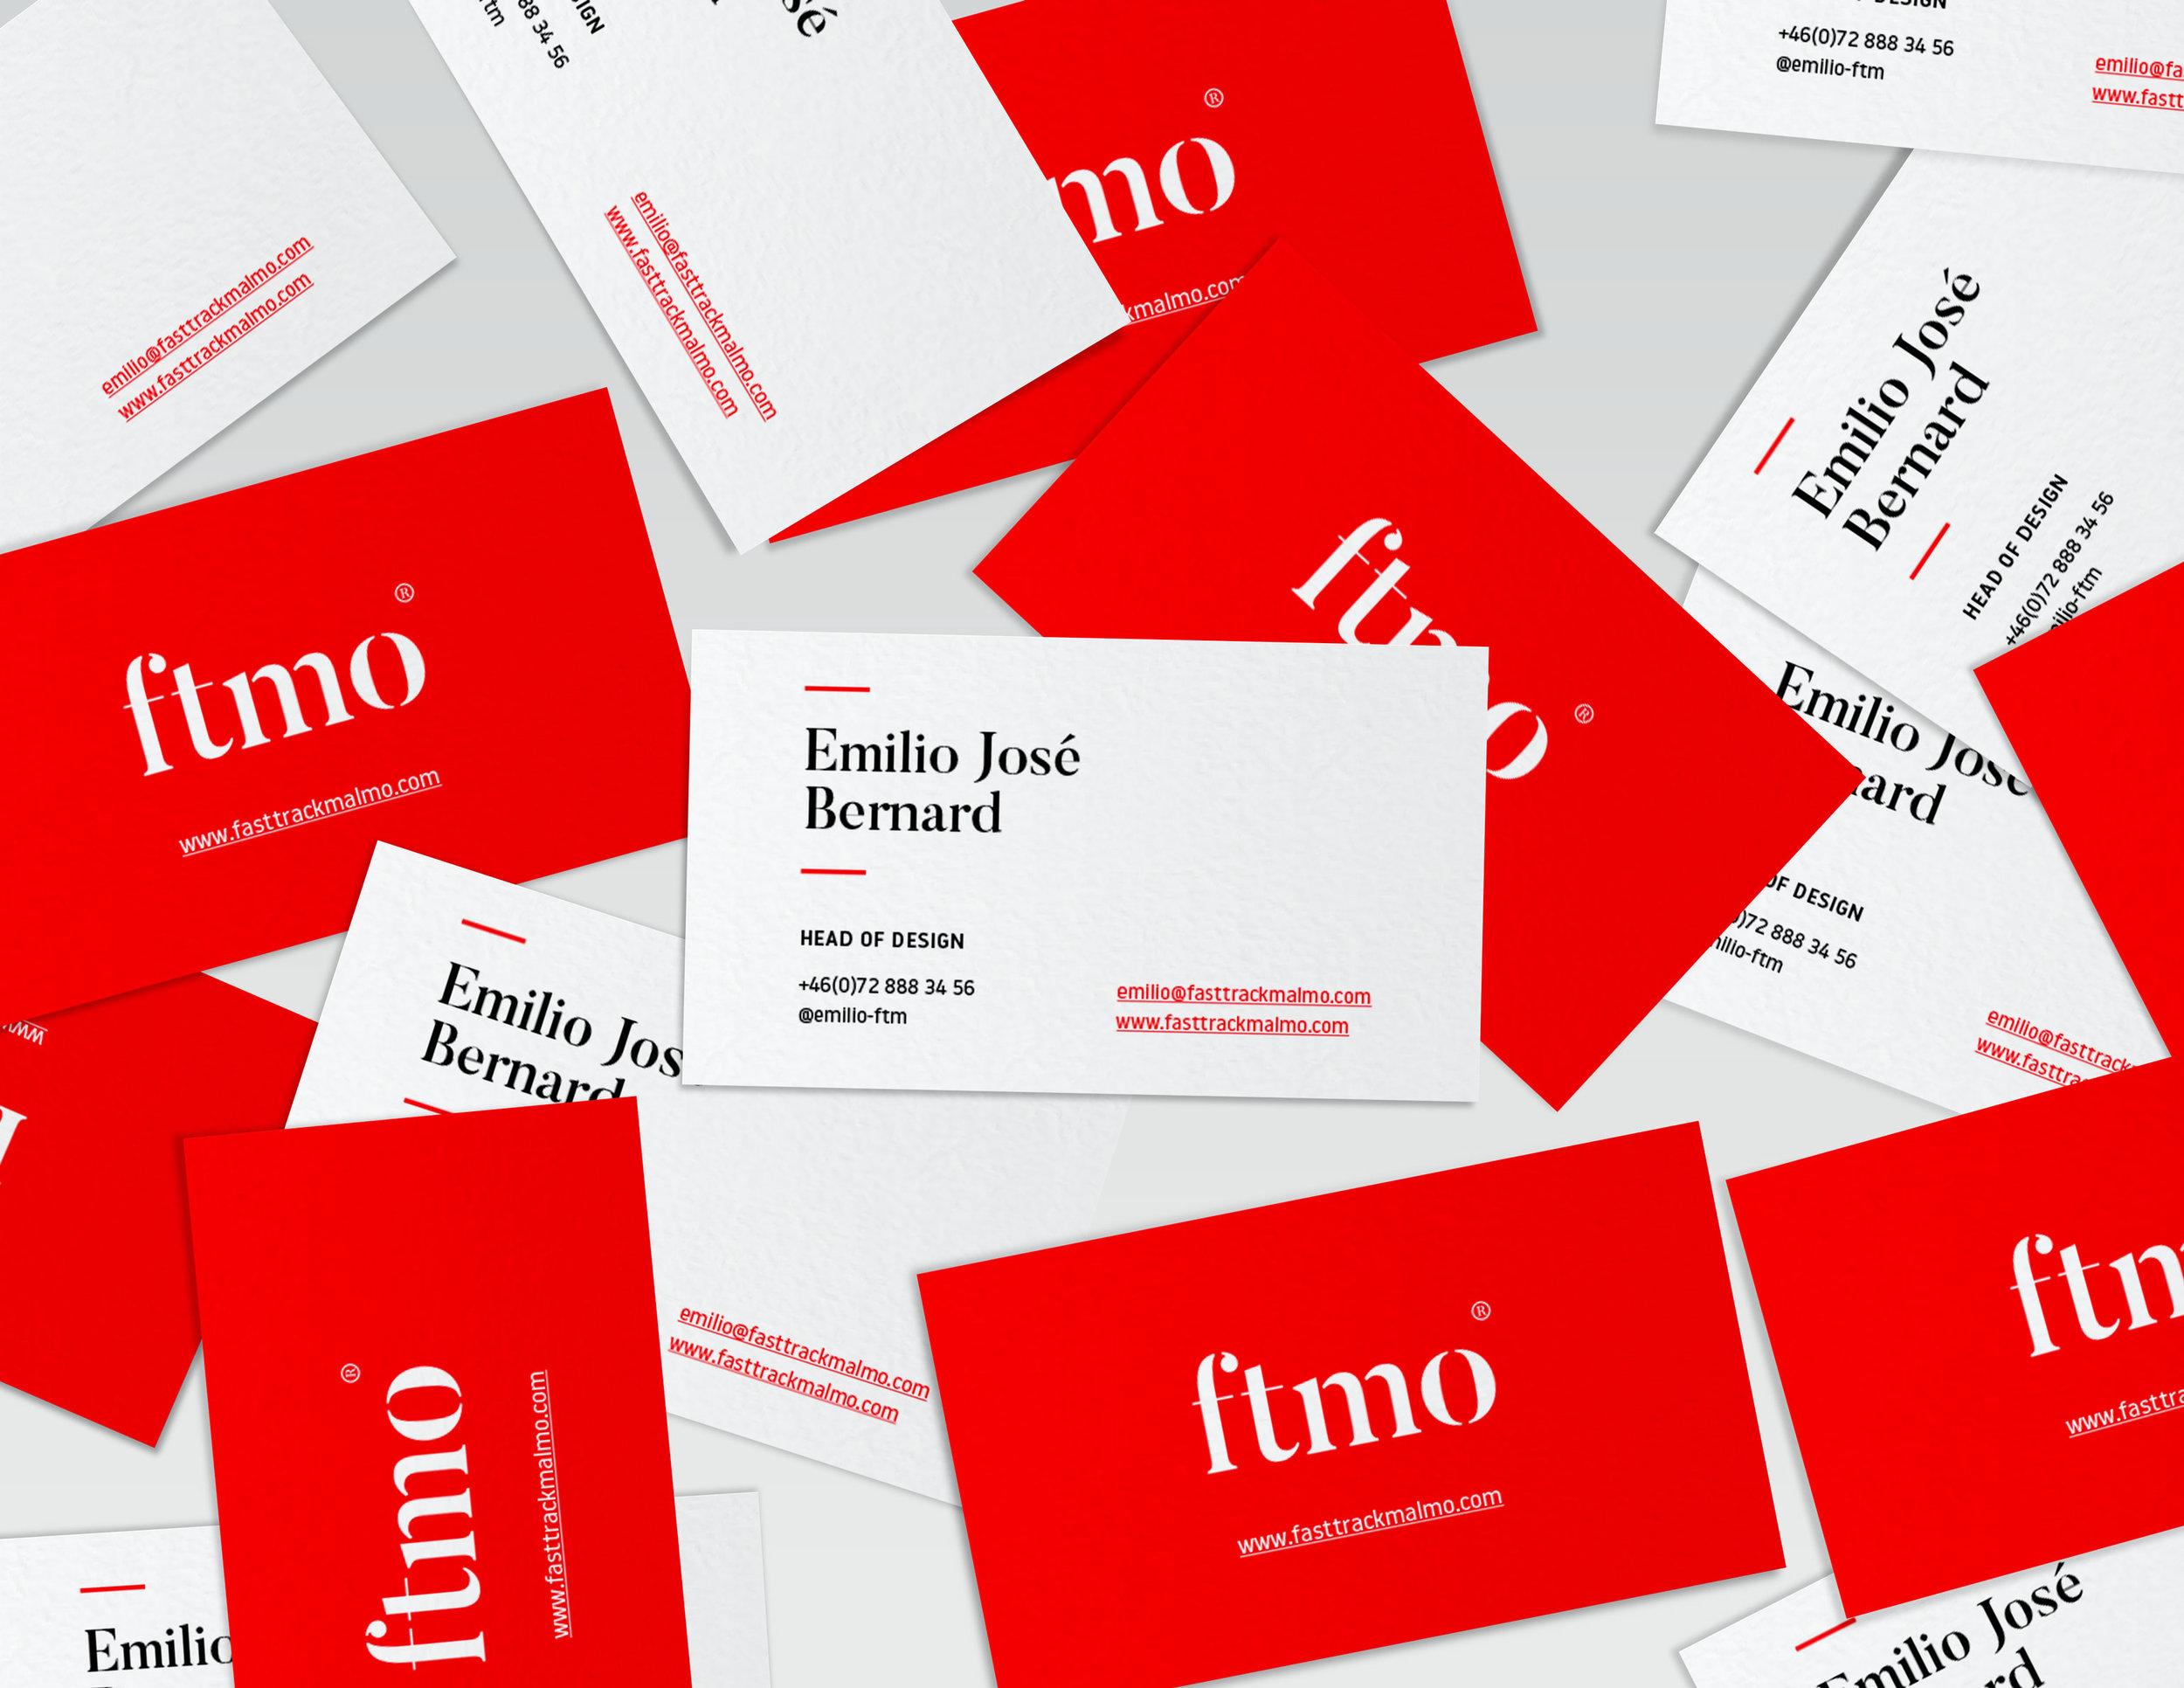 FTMO-BusinessCard-1.jpg